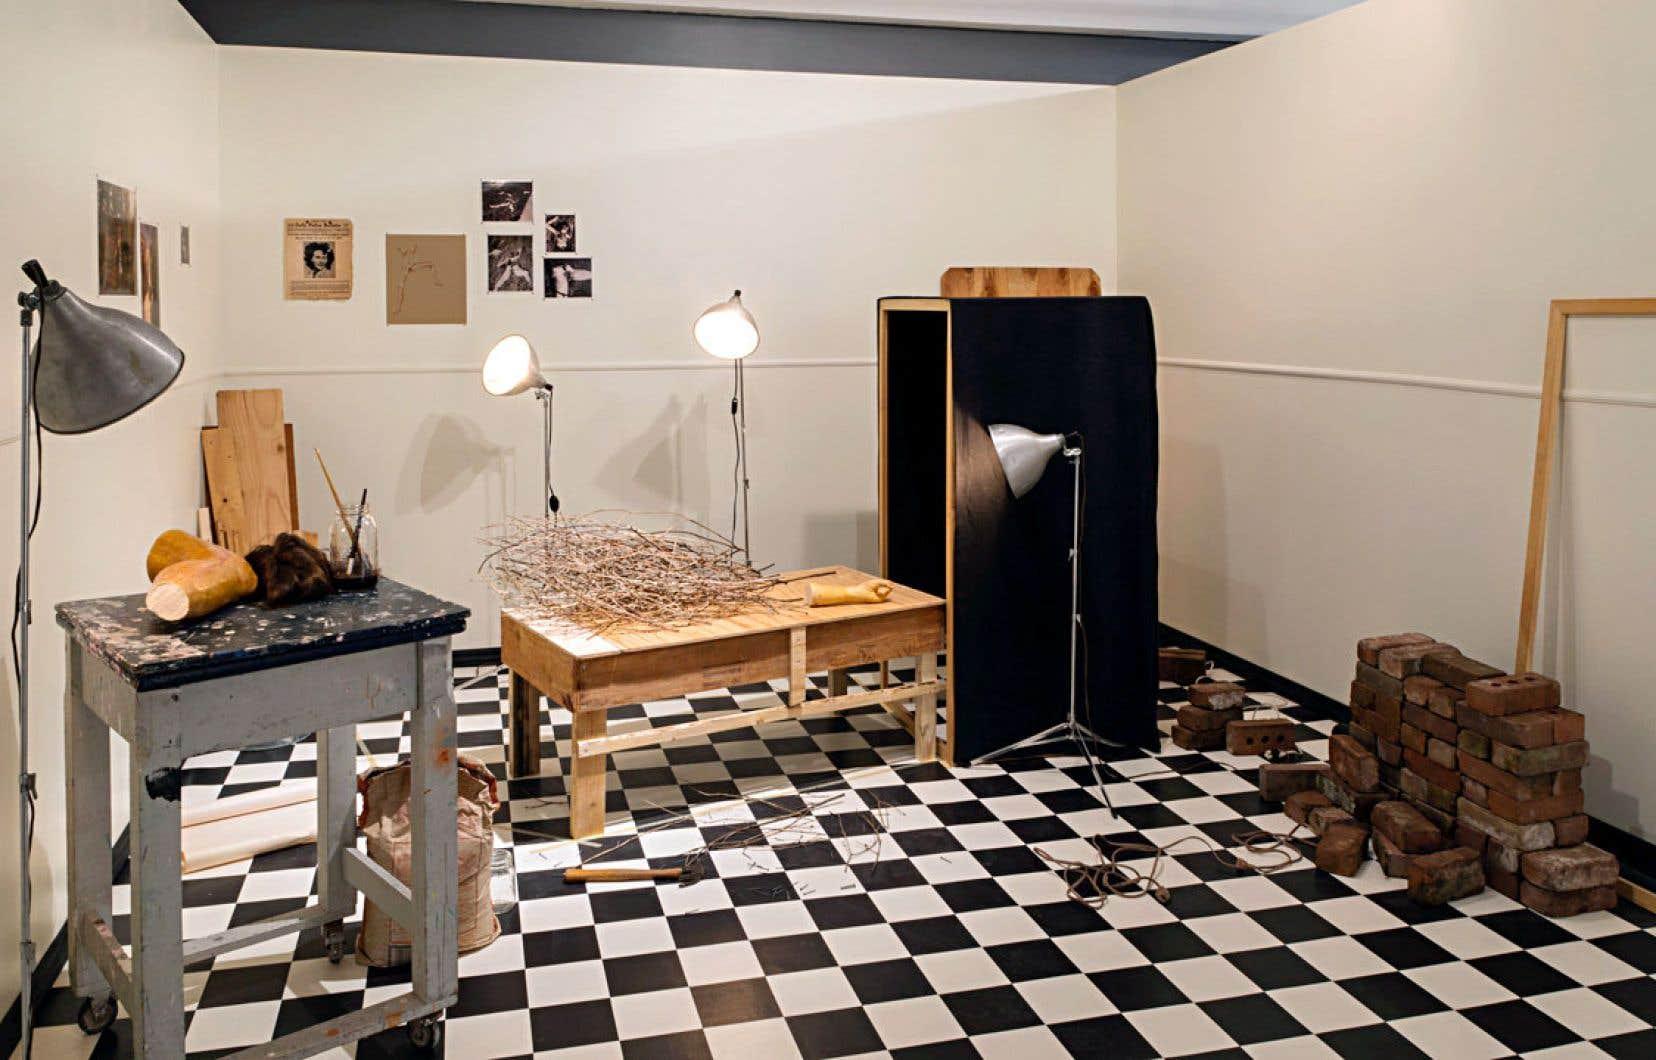 Vue de l'installation de Natascha Niederstrass chez Circa art actuel